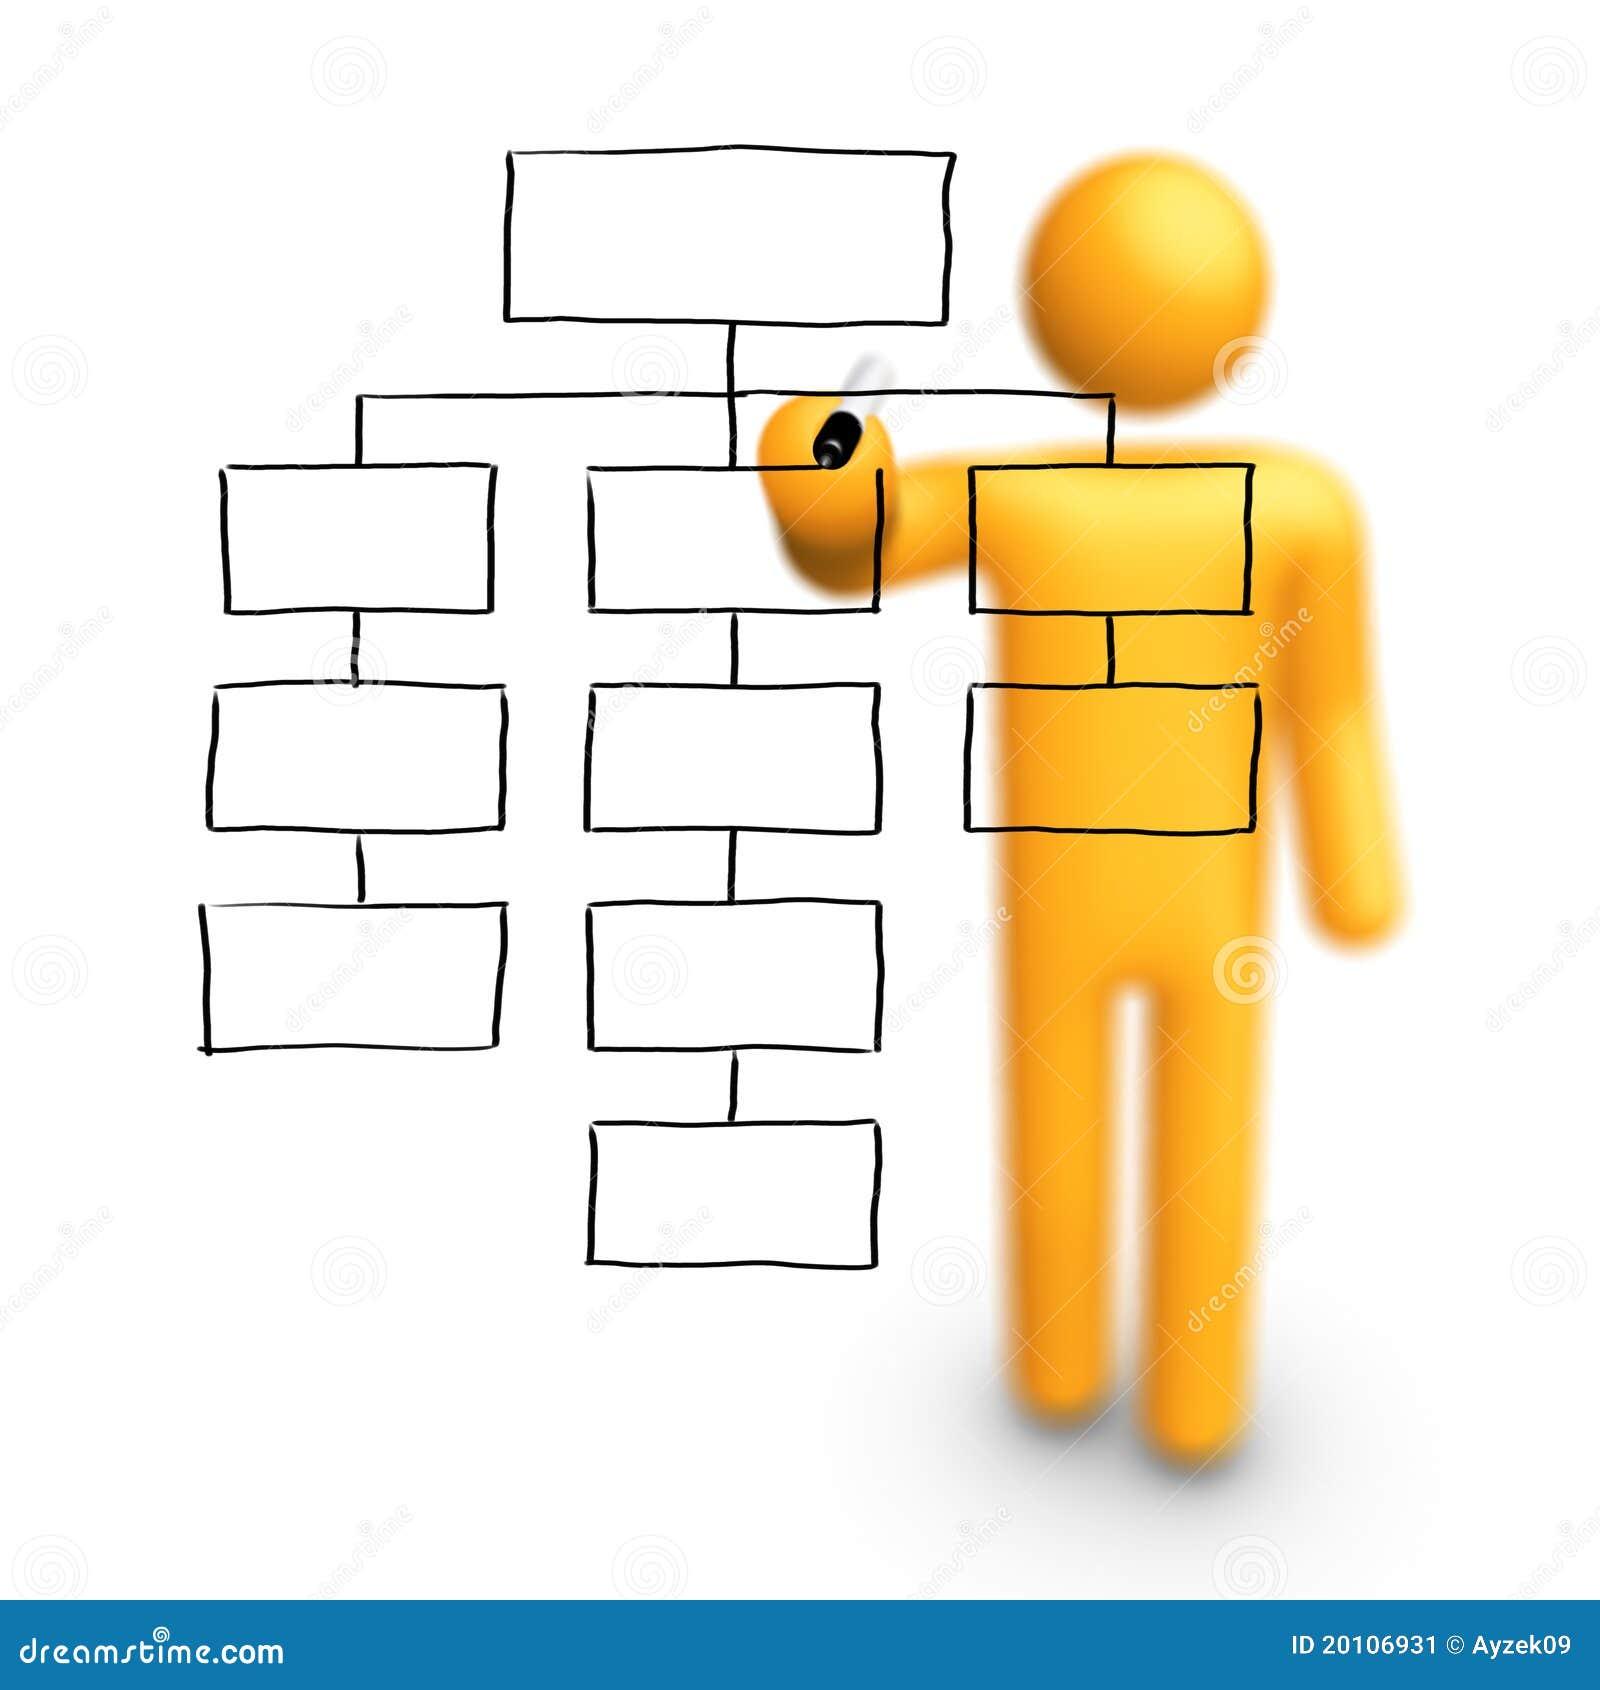 Organization Chart Stock Image - Image: 20106931